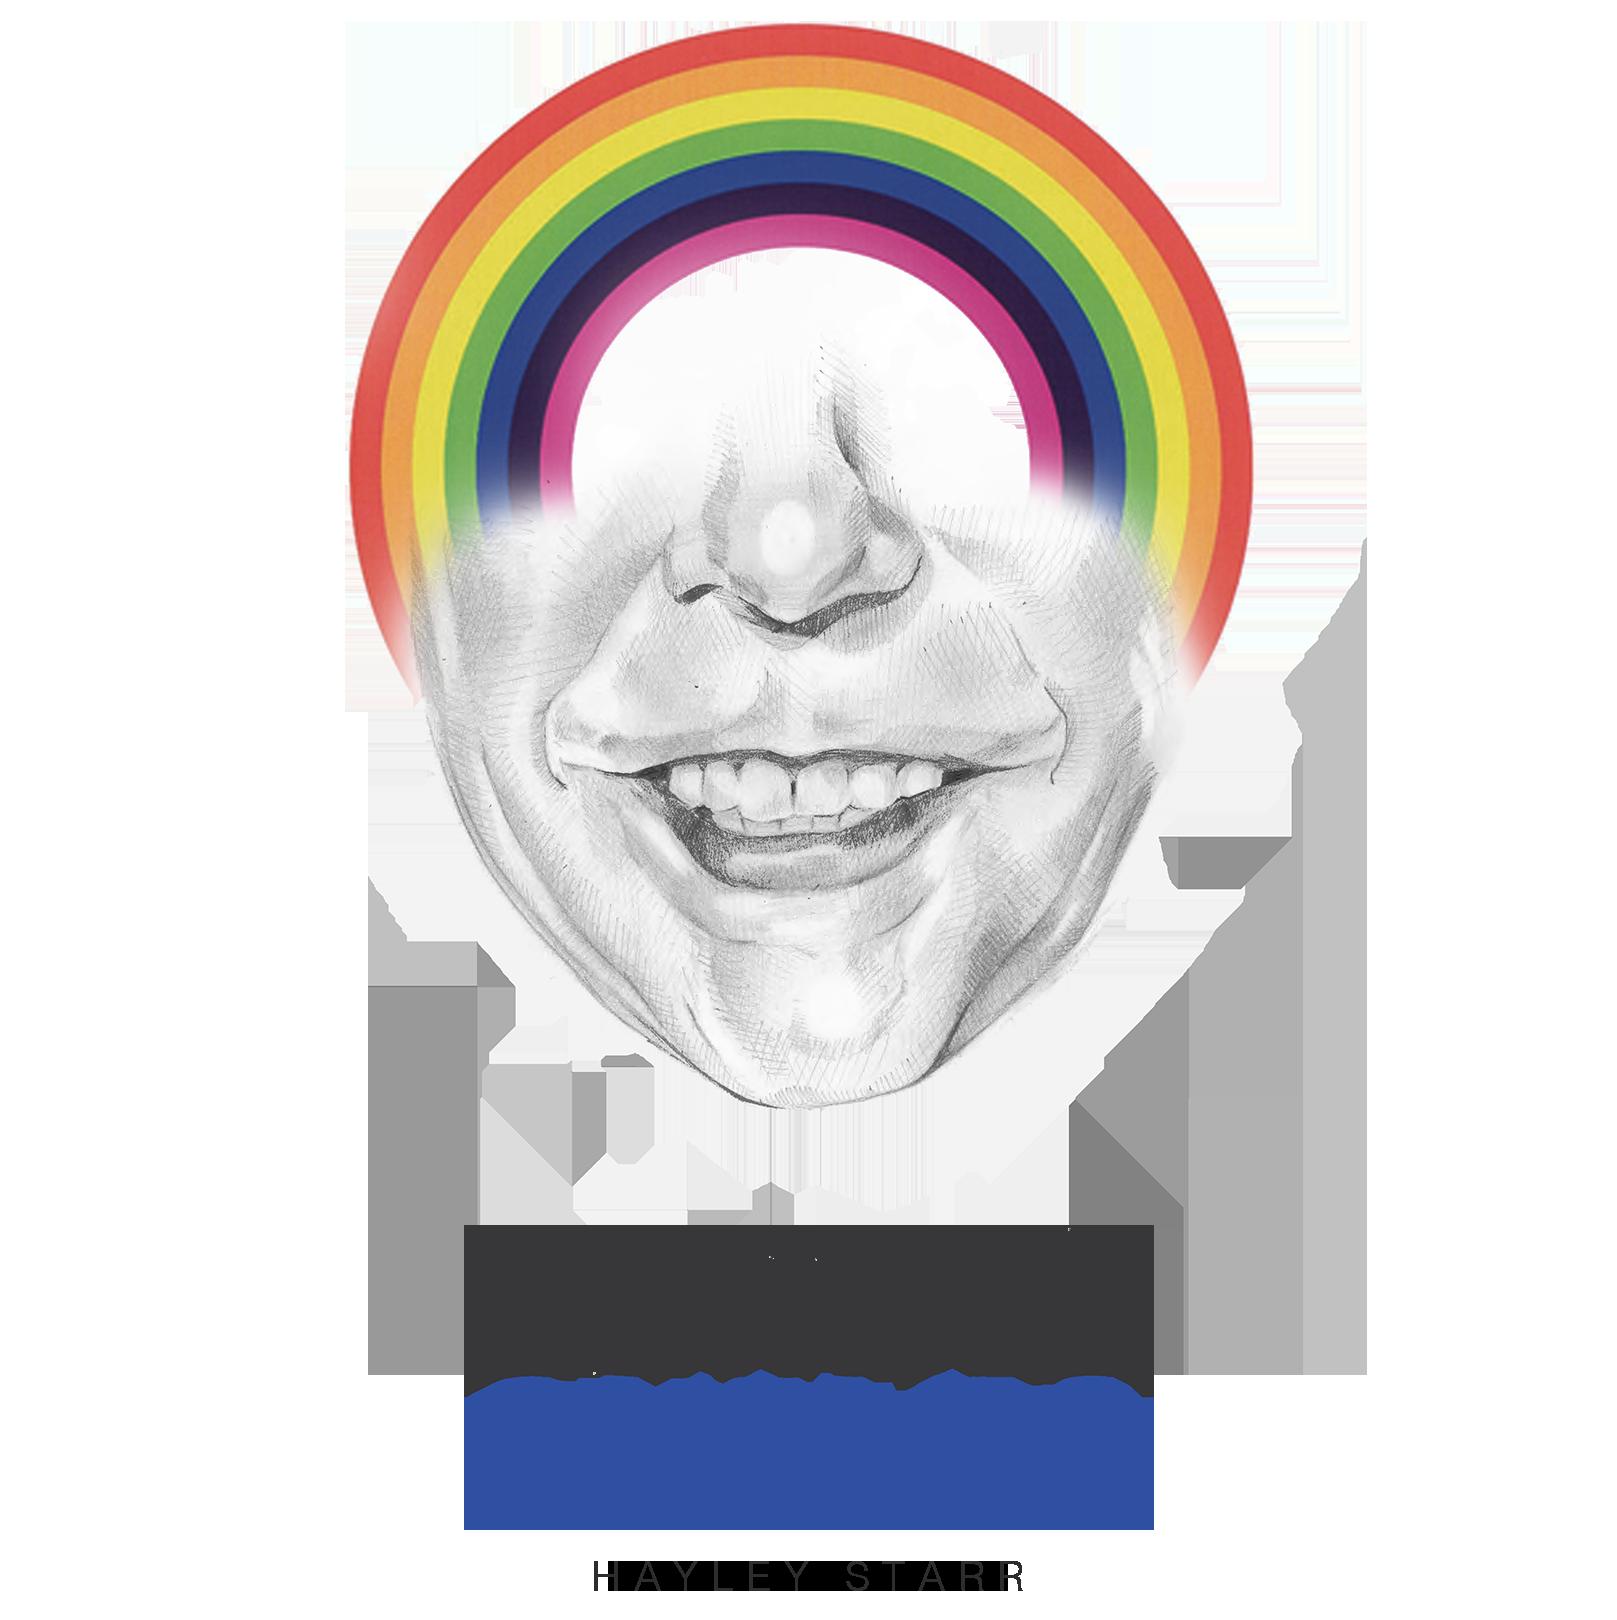 bernie smiles to print.png